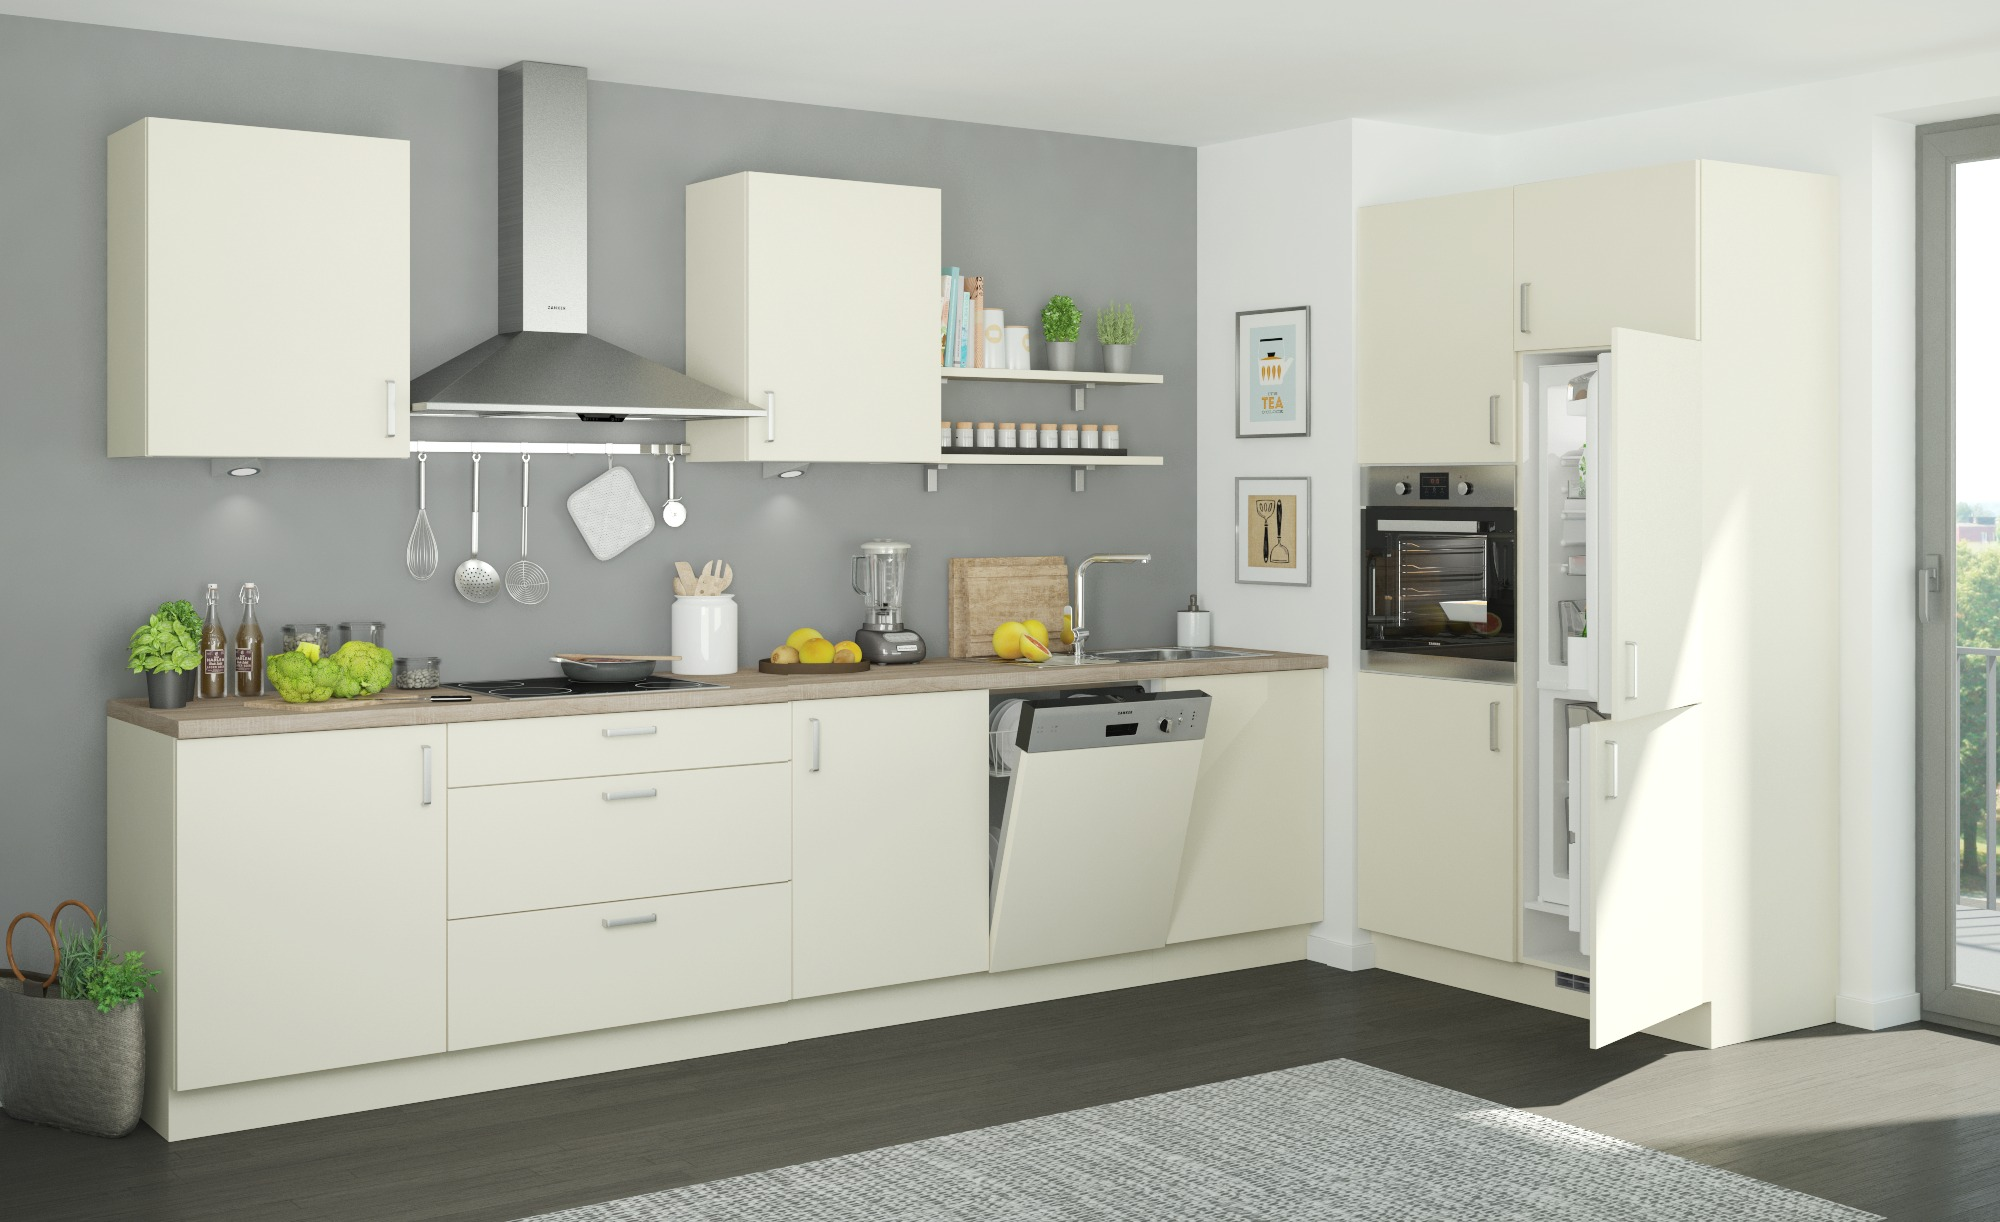 Full Size of Neue Küche Ohne Elektrogeräte Sinnvoll Was Kostet Eine Küche Ohne Elektrogeräte Küche Ohne Elektrogeräte Kaufen Küche Ohne Elektrogeräte Kaufen Sinnvoll Küche Küche Ohne Elektrogeräte